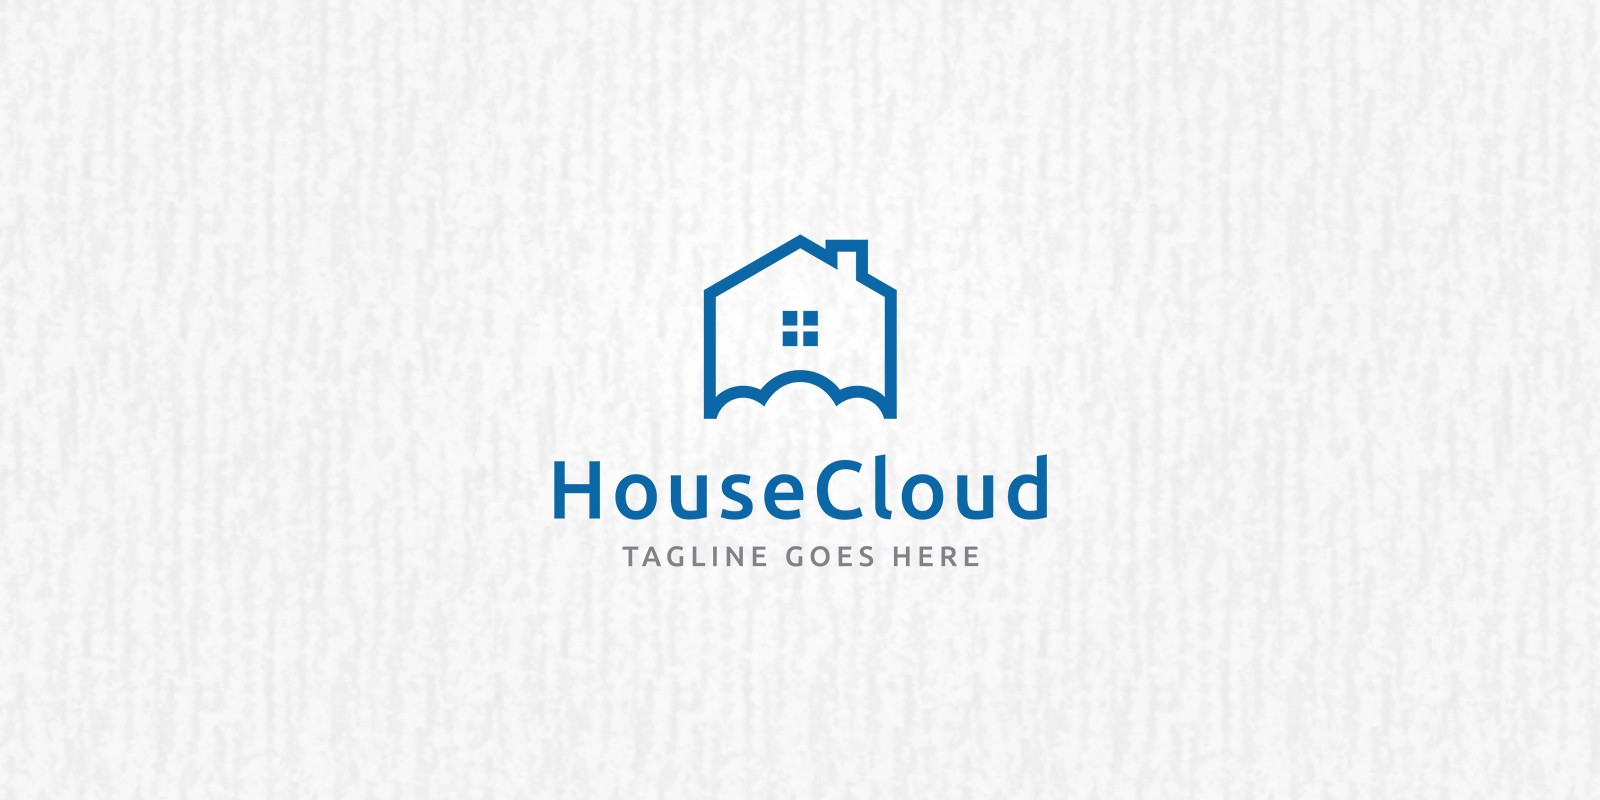 House Cloud - Logo Template - Building Logo Templates | Codester